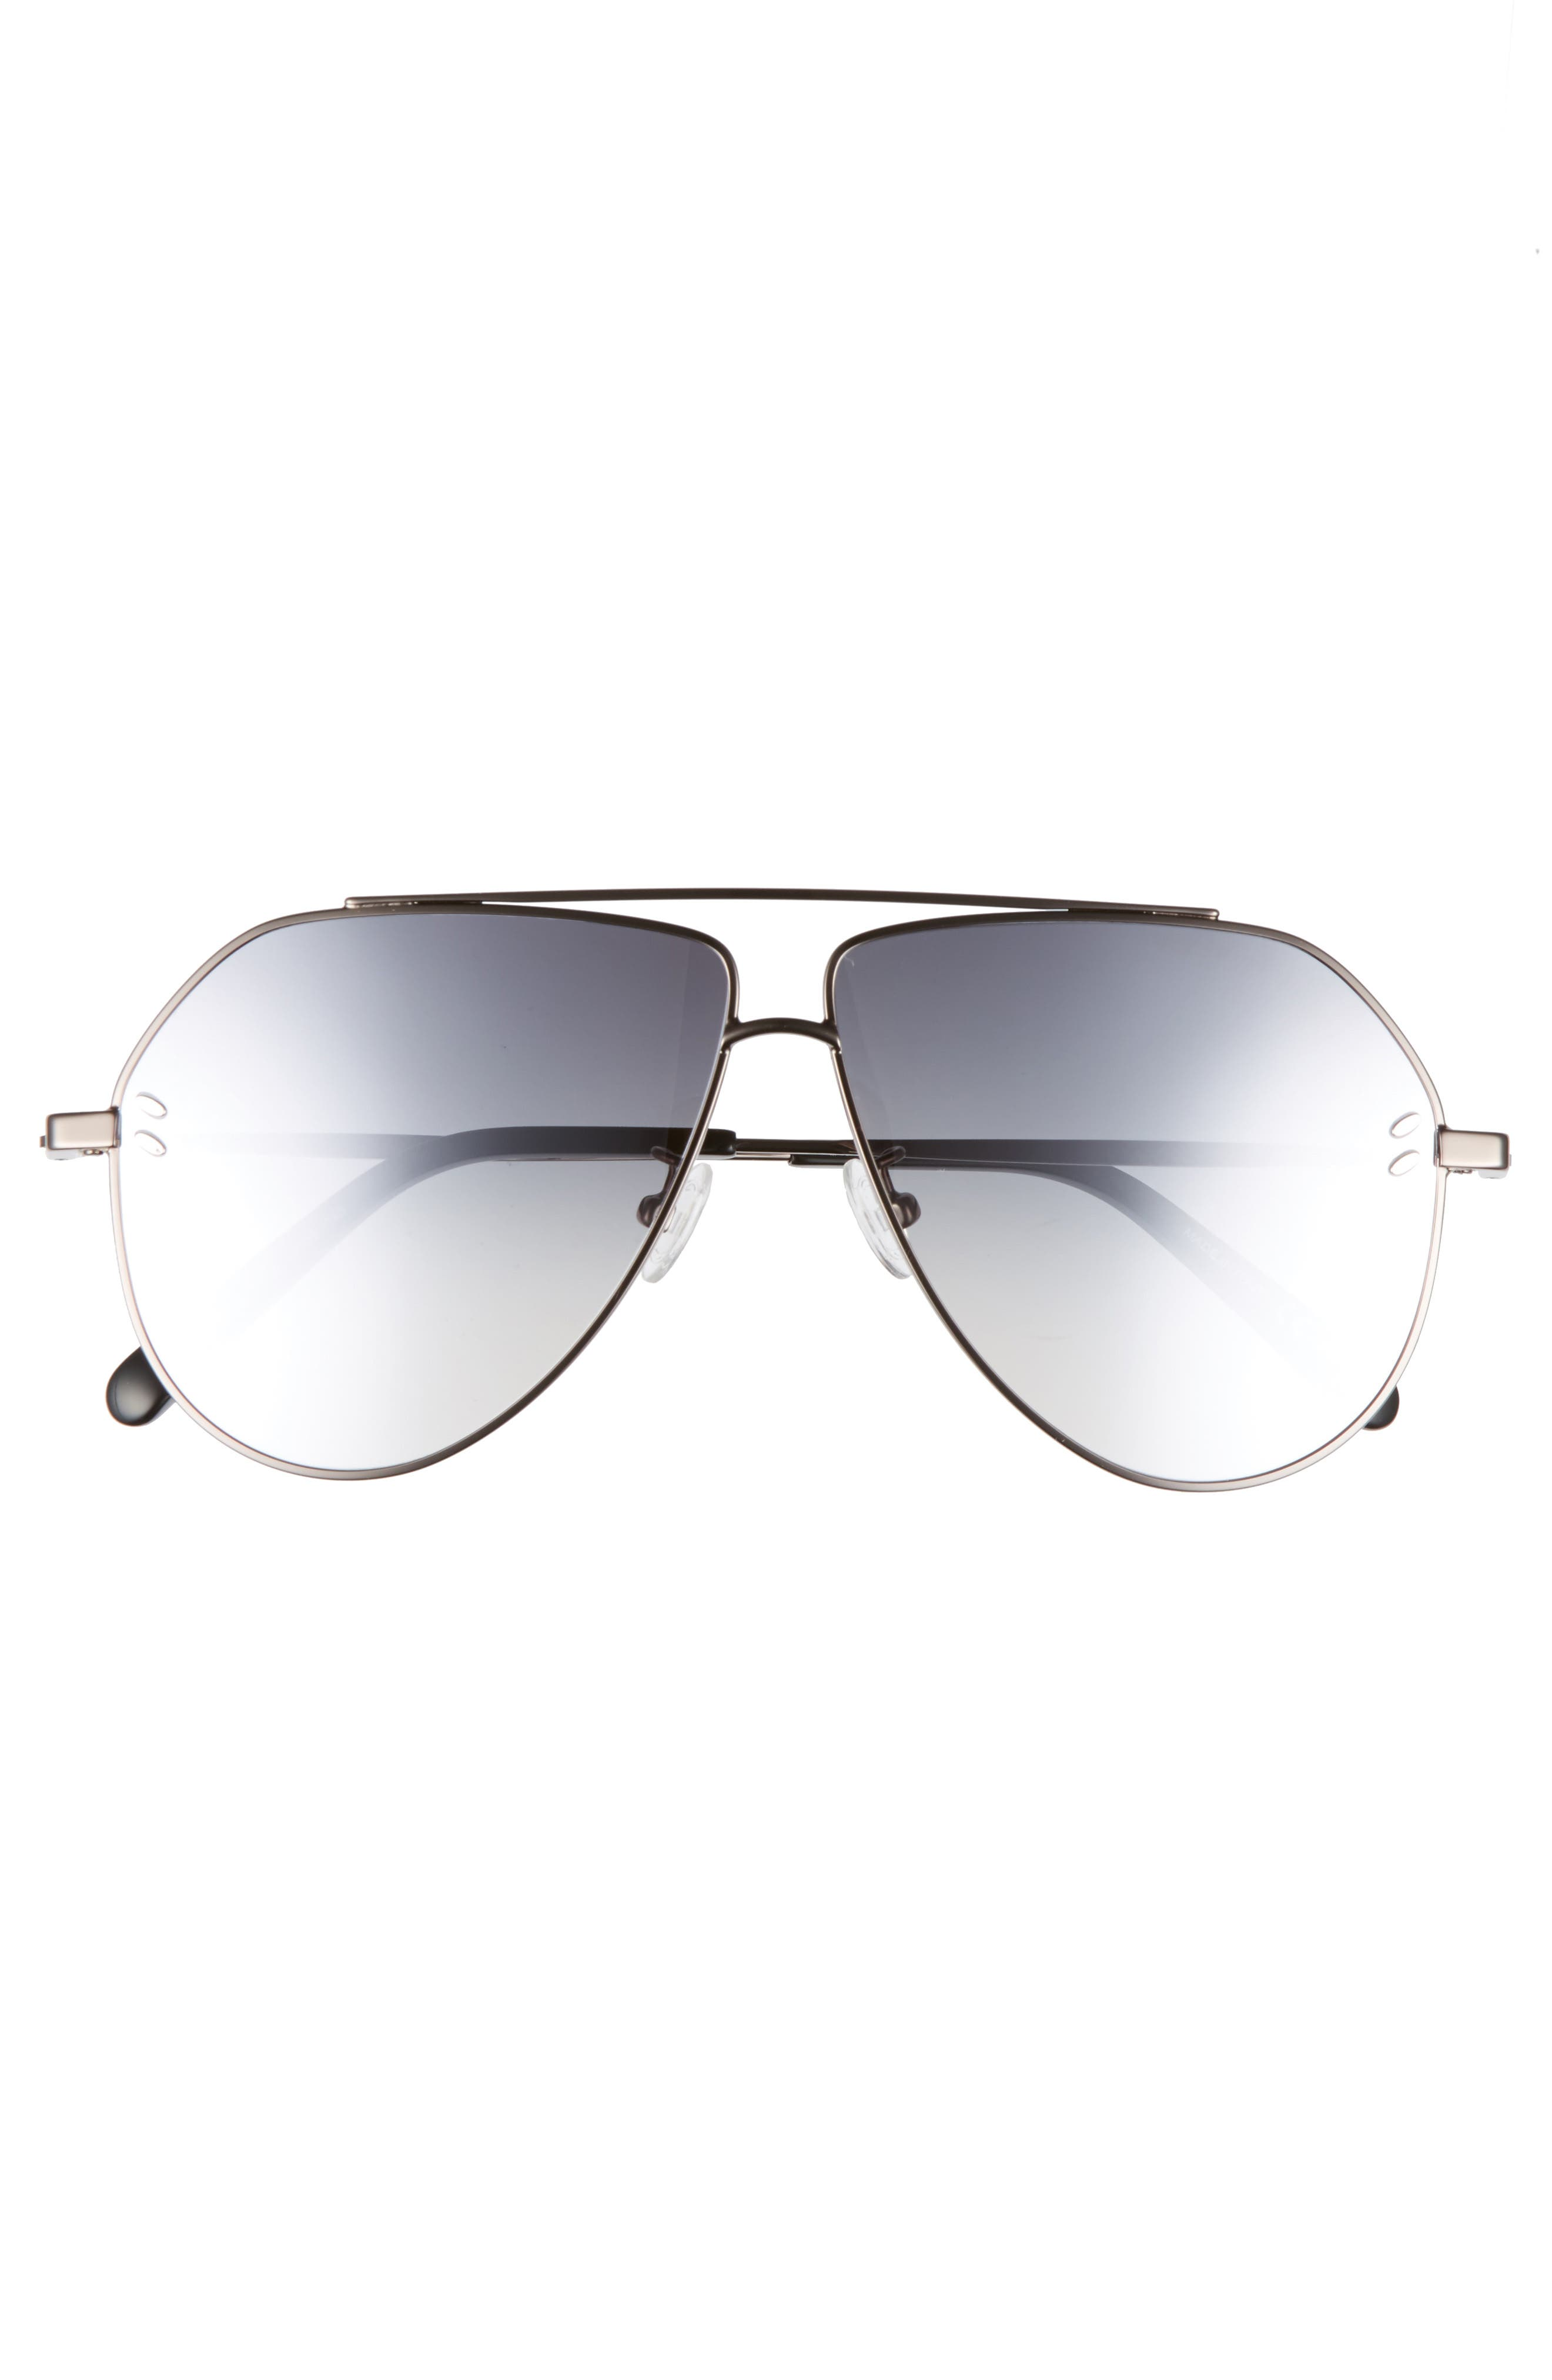 60mm Aviator Sunglasses,                             Alternate thumbnail 3, color,                             Ruthenium